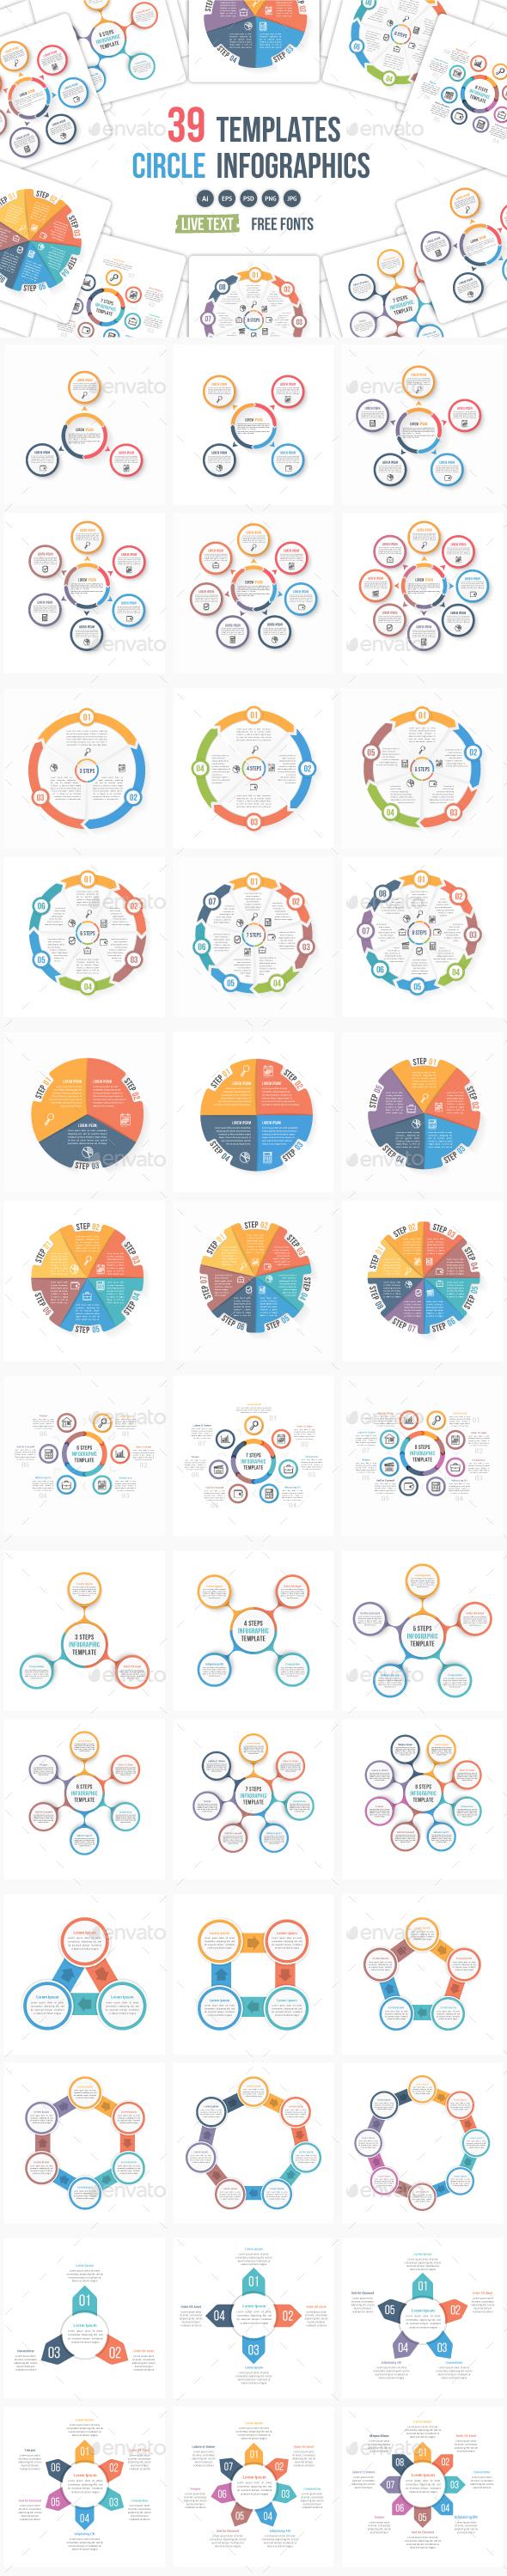 39 Circle Infographic Templates Bundle - Infographics